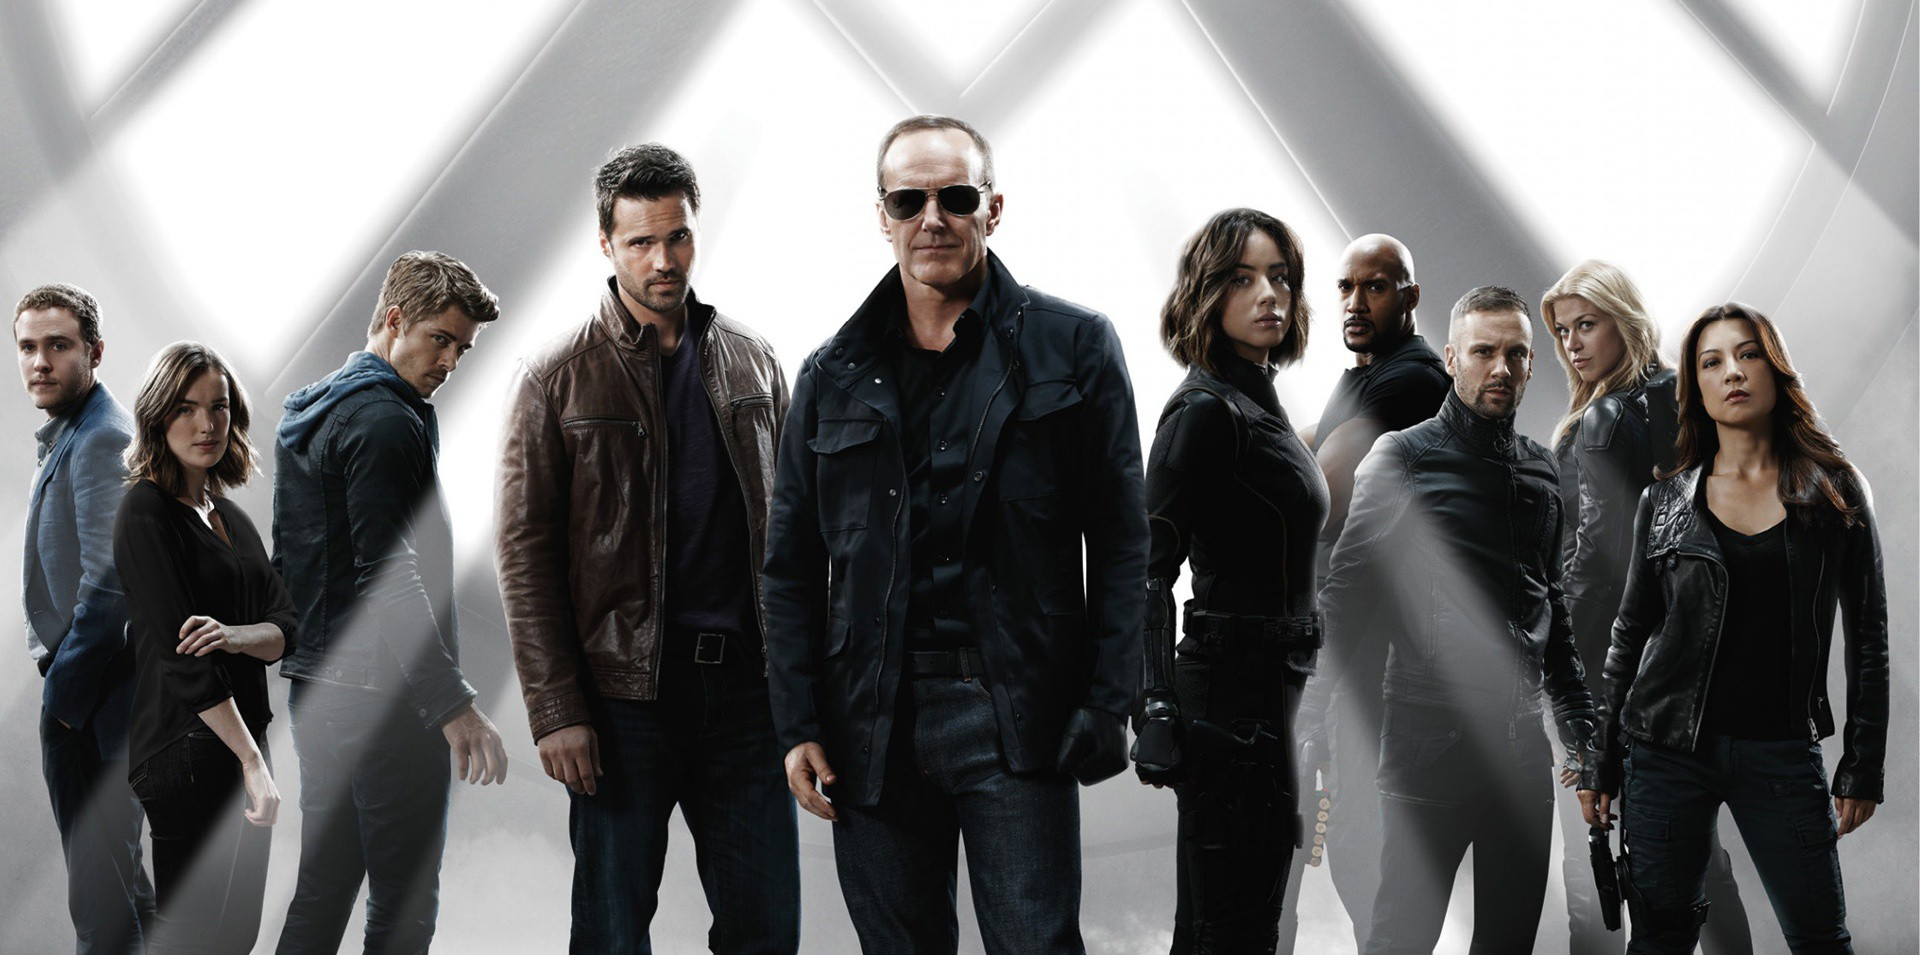 marvel agents of shield - photo #15